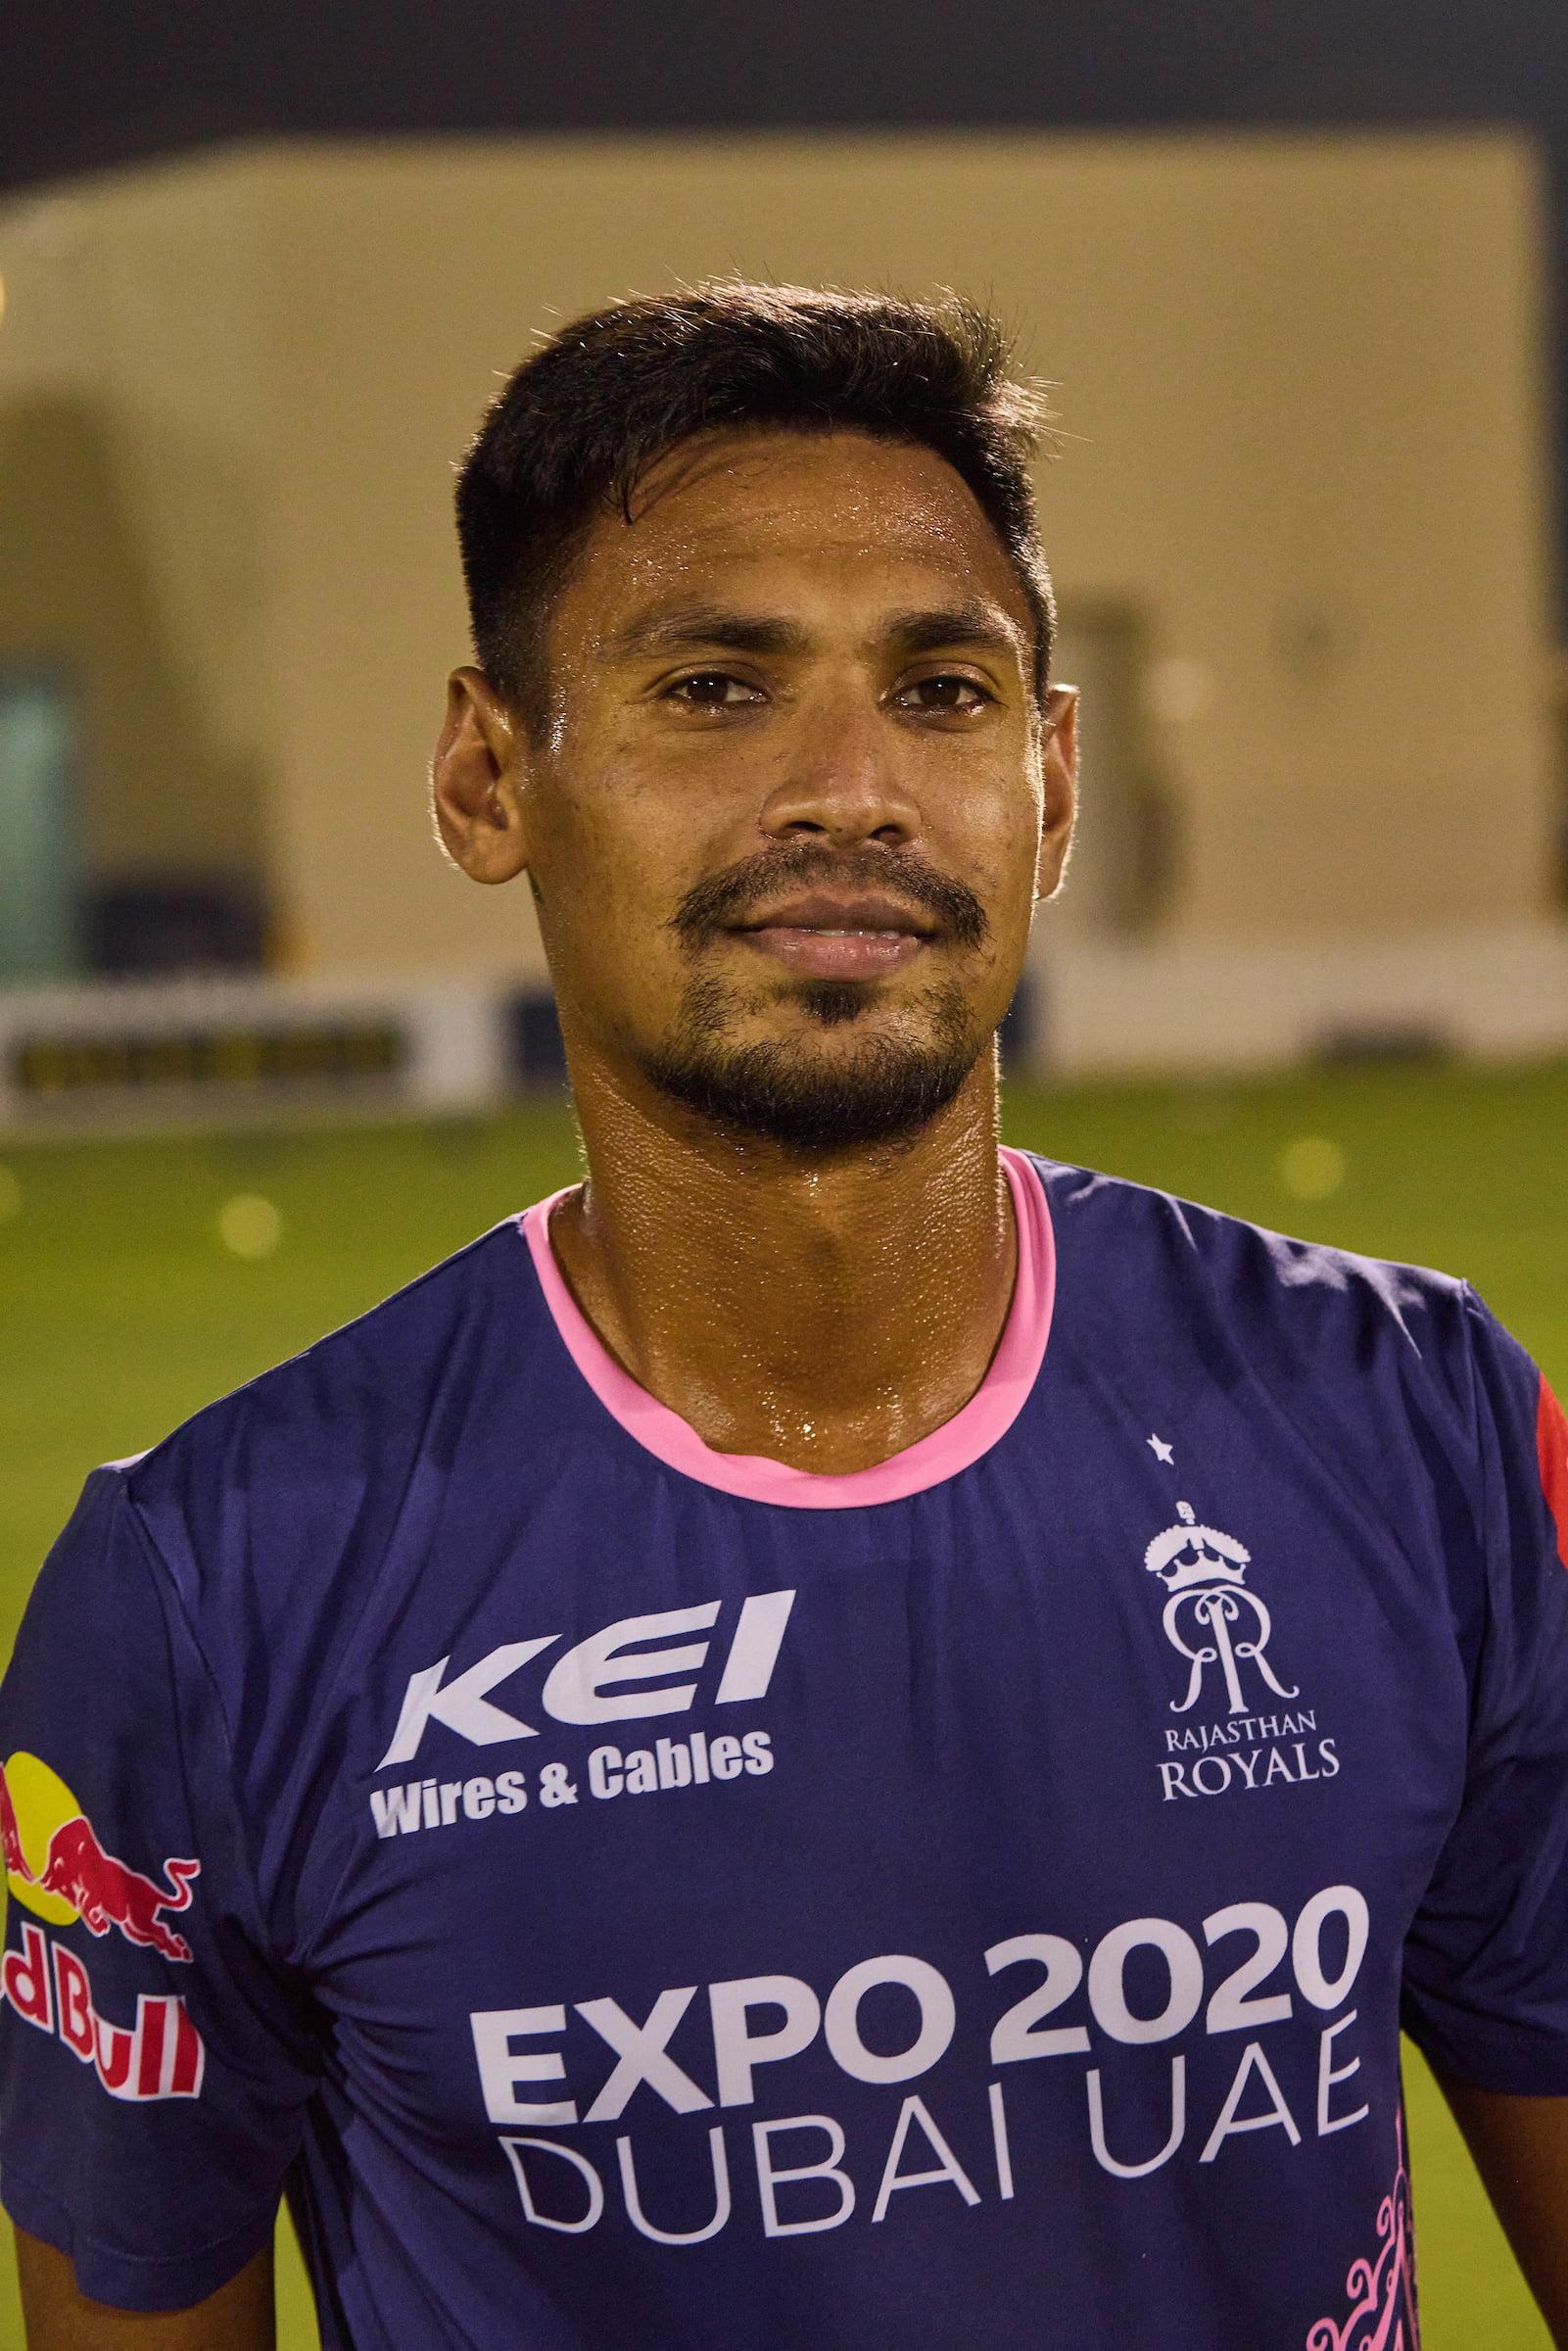 Everyone is excited to start off well: Rajasthan Royals' Mustafizur Rahman ahead of Punjab Kings encounter